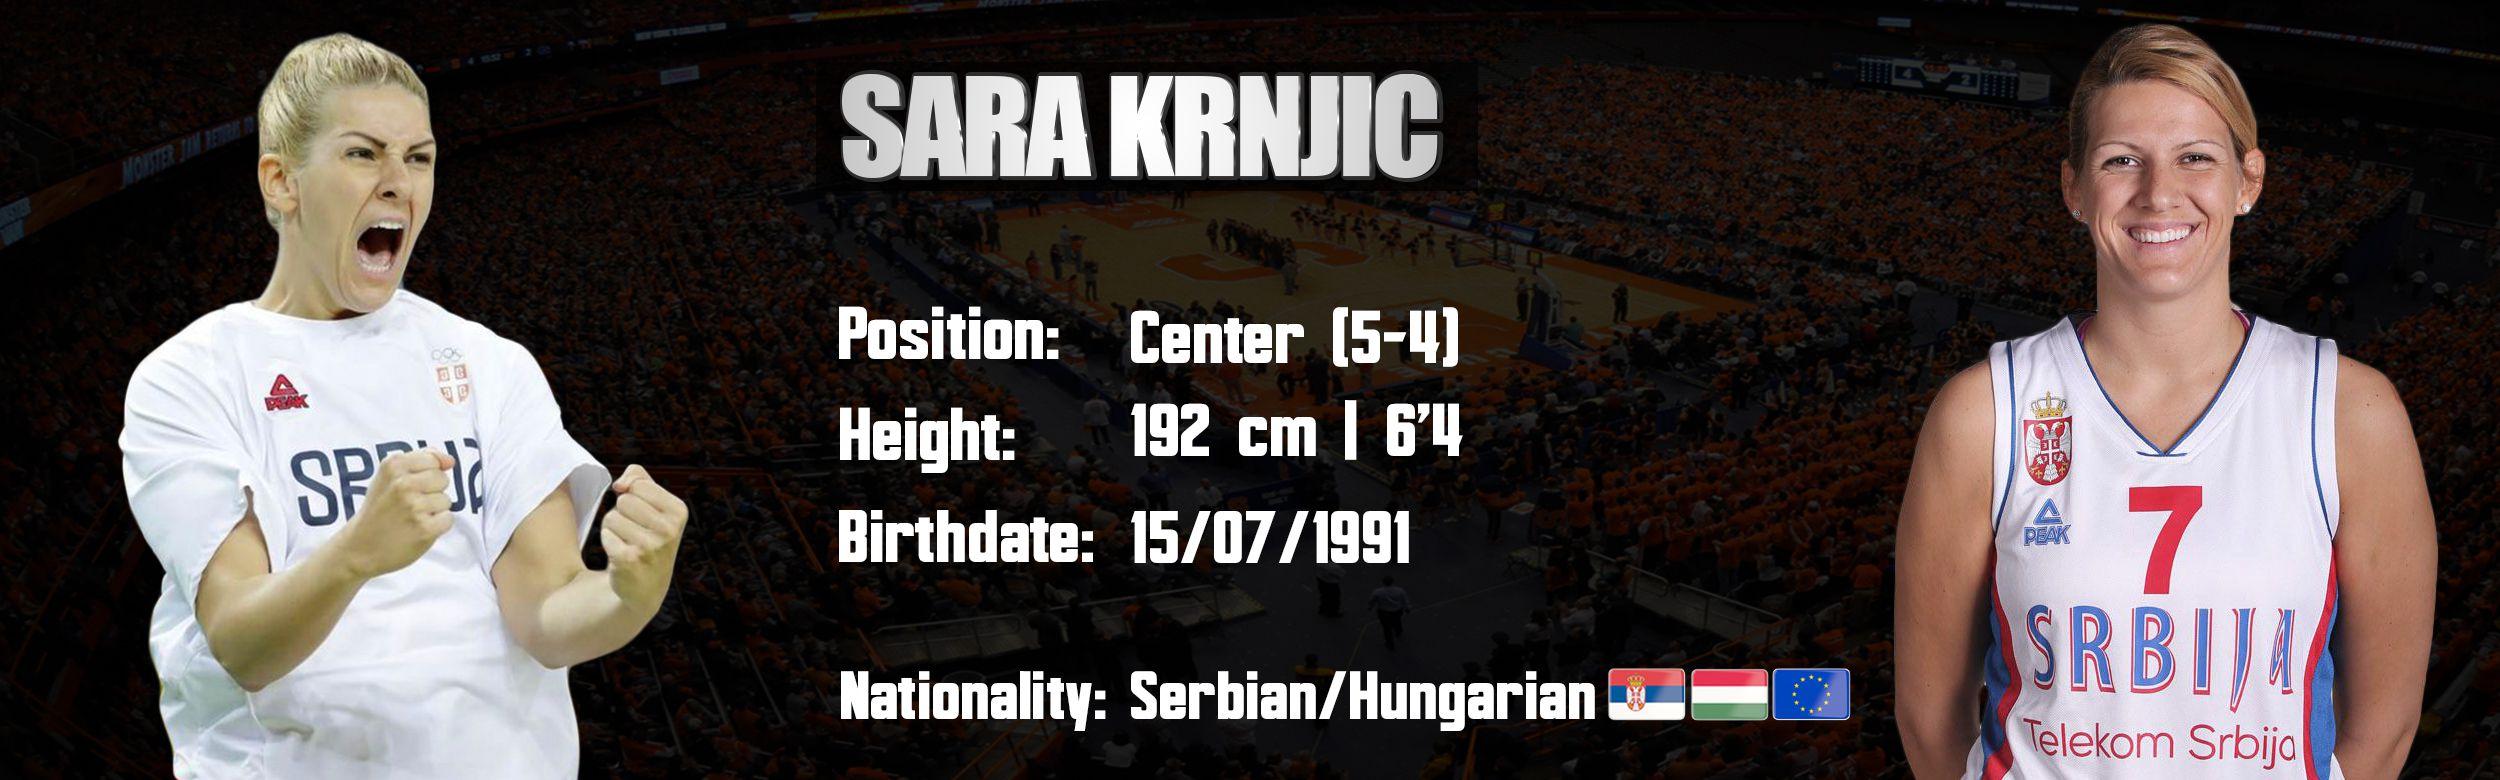 Sara Krnjic